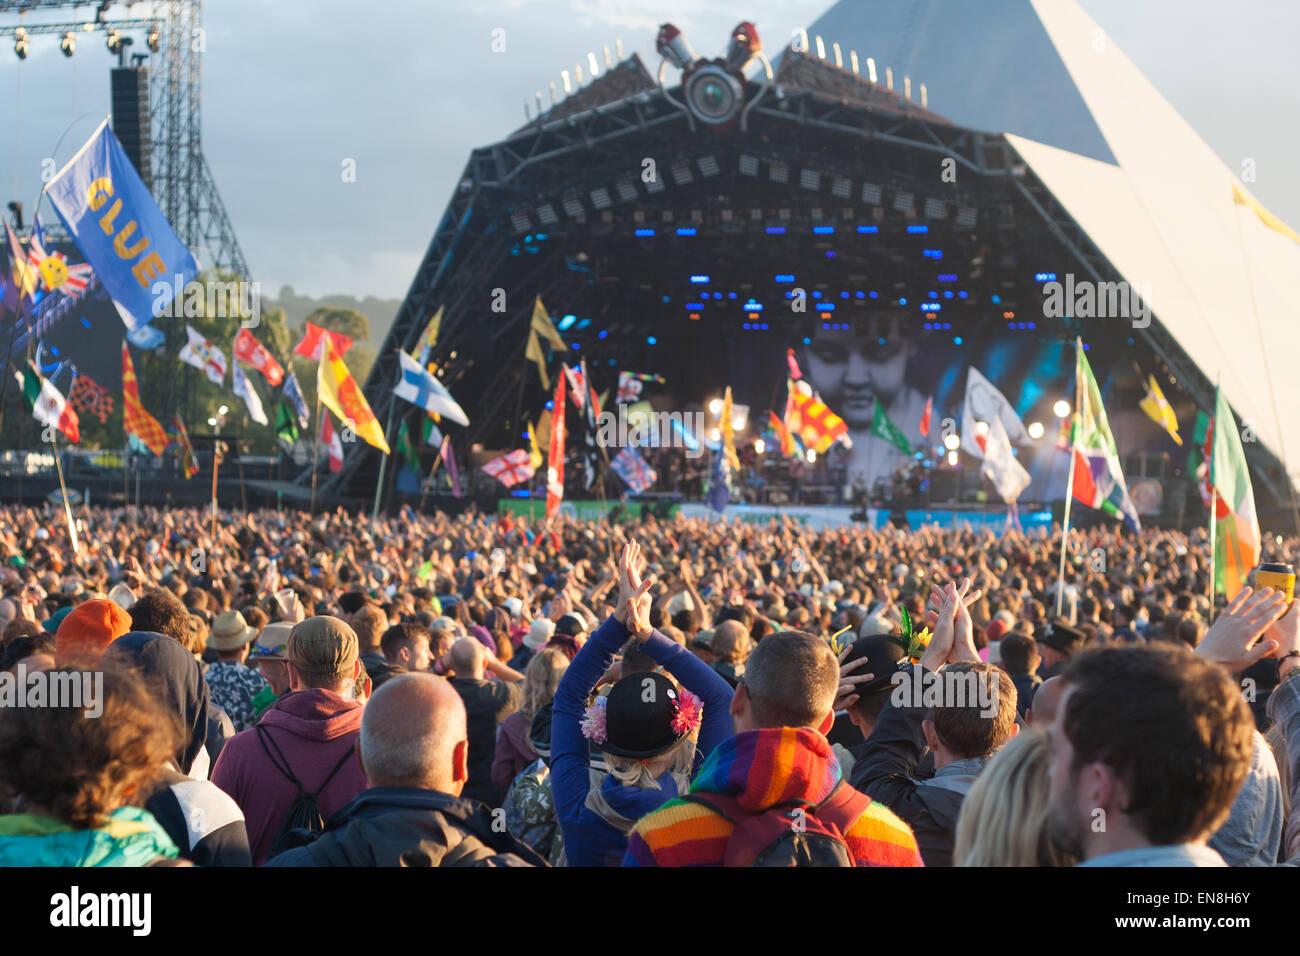 GLASTONBURY, UK - 28 Juni: Festival Besucher genießen Ellenbogen beim Glastonbury Festival am 28. Juni 2014 bei Stockfoto